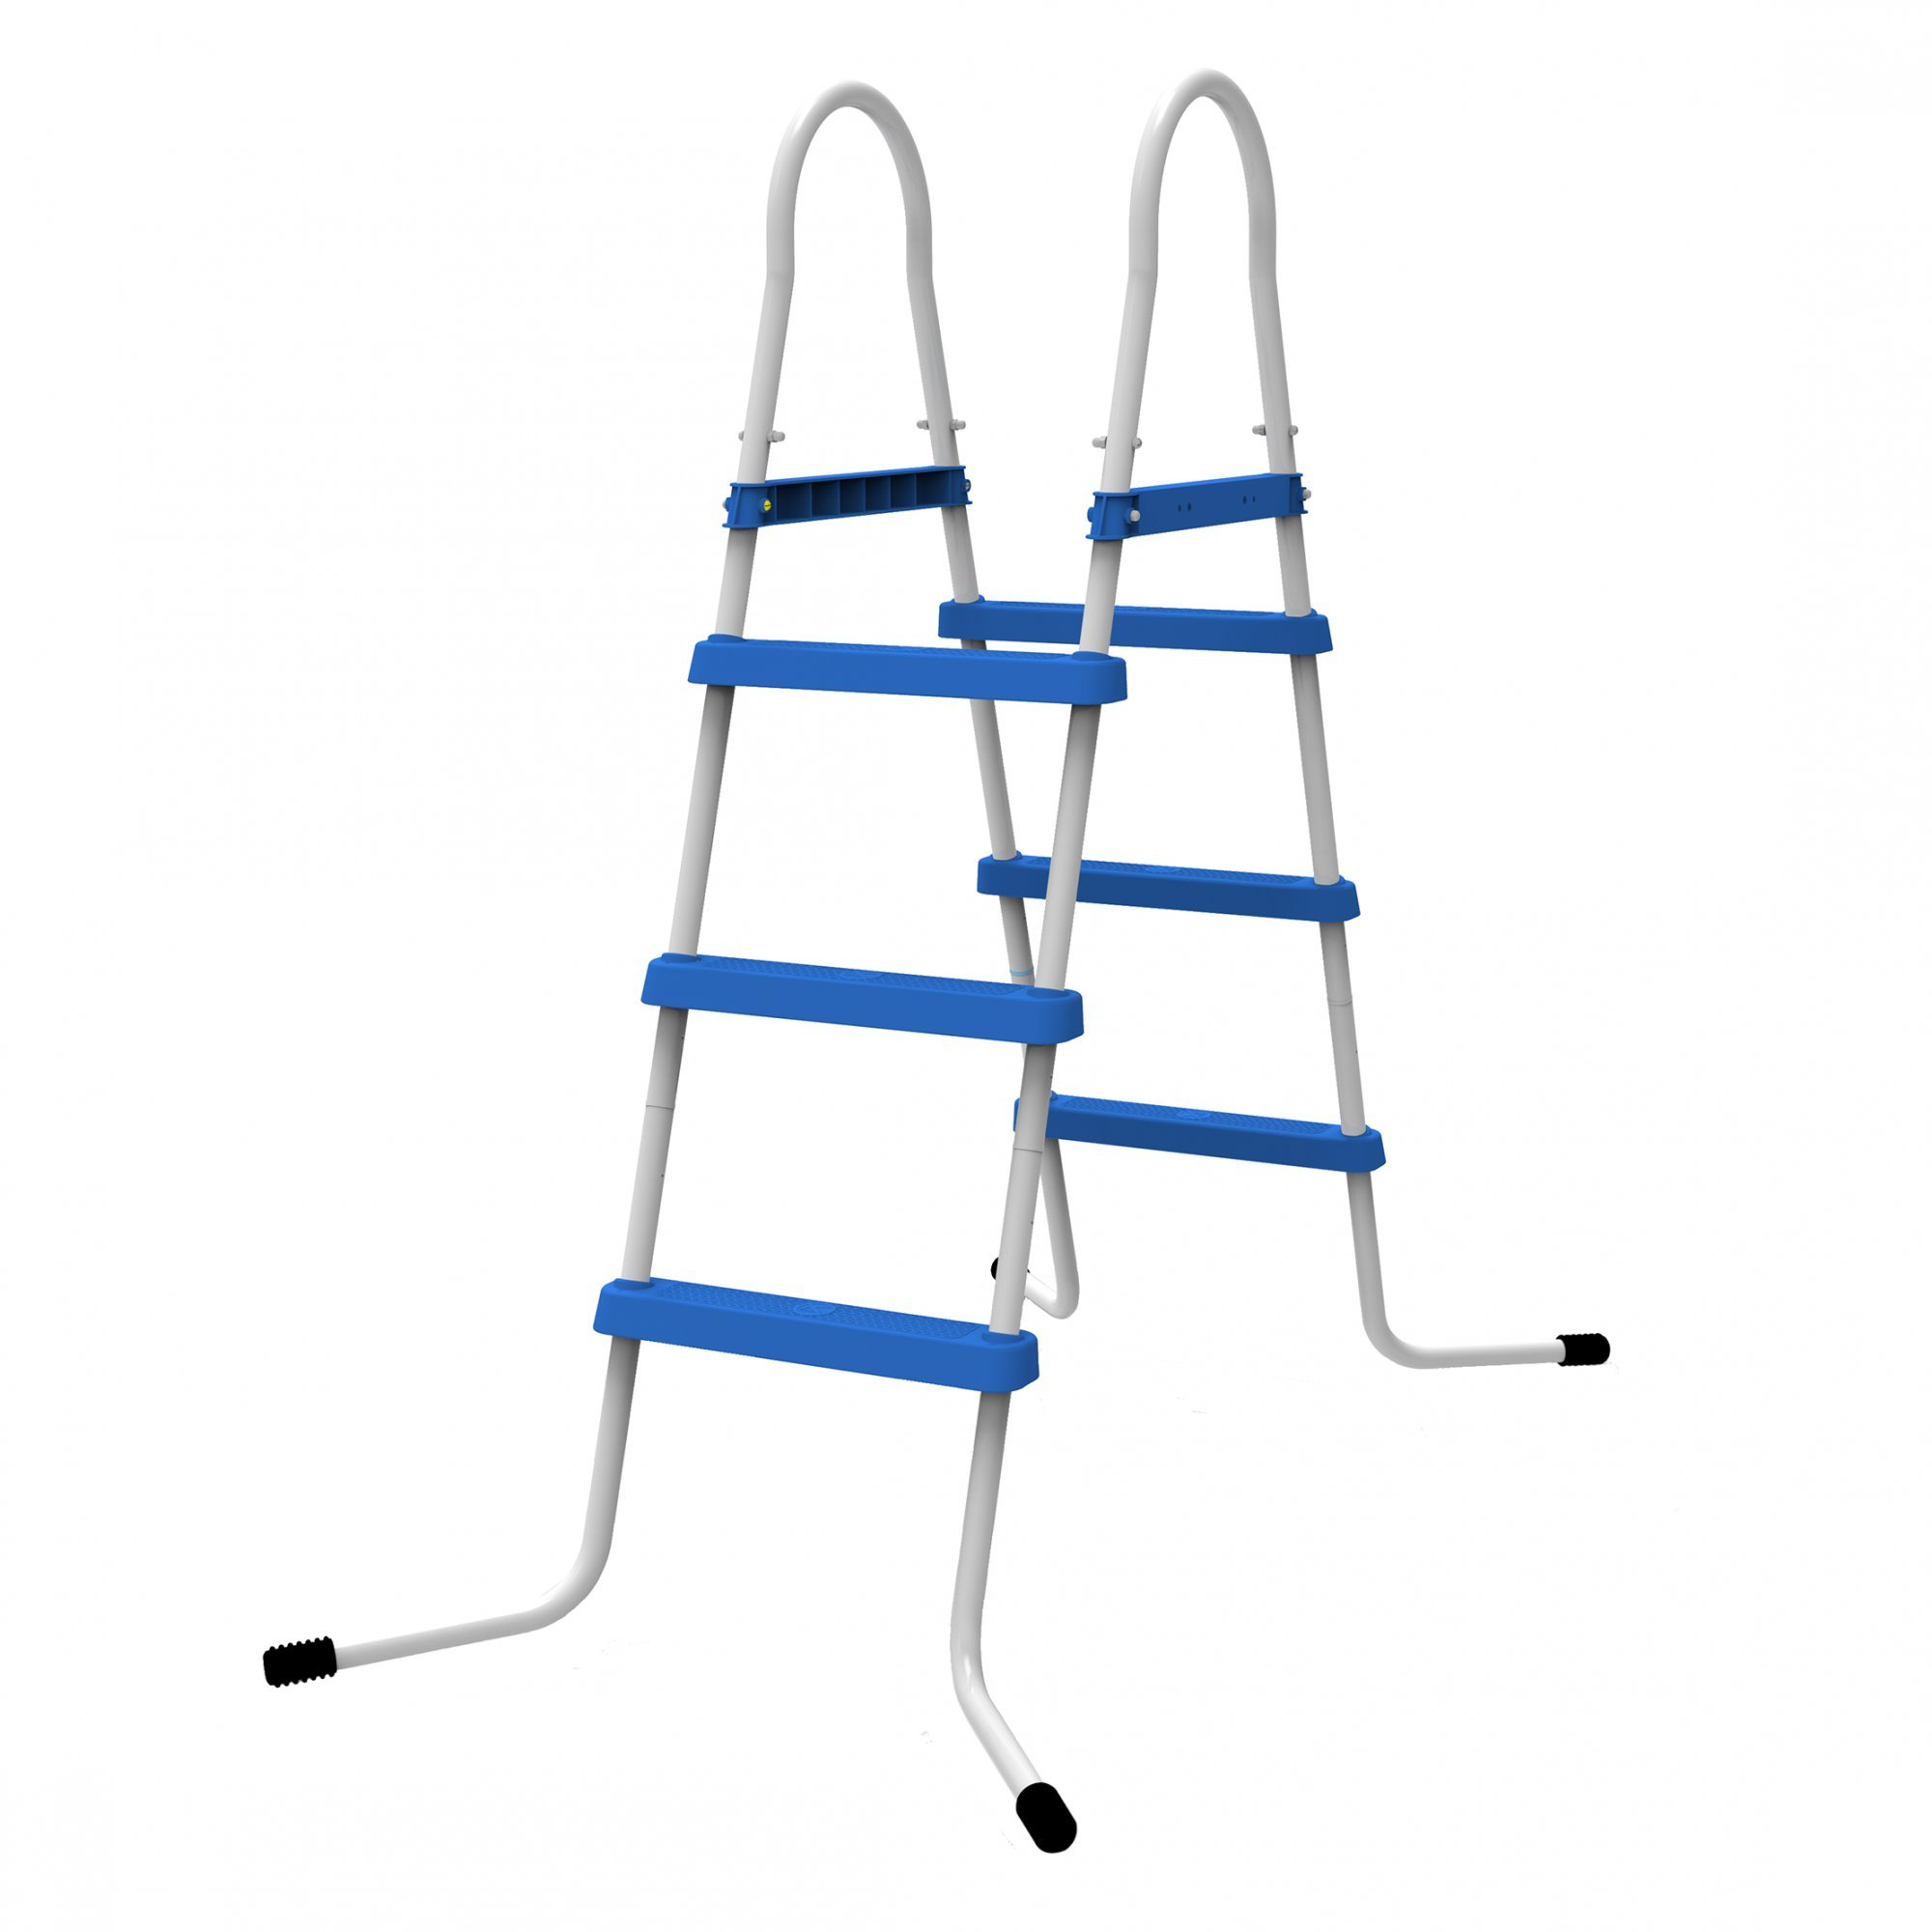 Jilong 3 Niveles Pool Escalera para Piscina Pared Alturas hasta 109 cm, Azul, 80 x 60 x 140 cm, 29r145: Amazon.es: Jardín